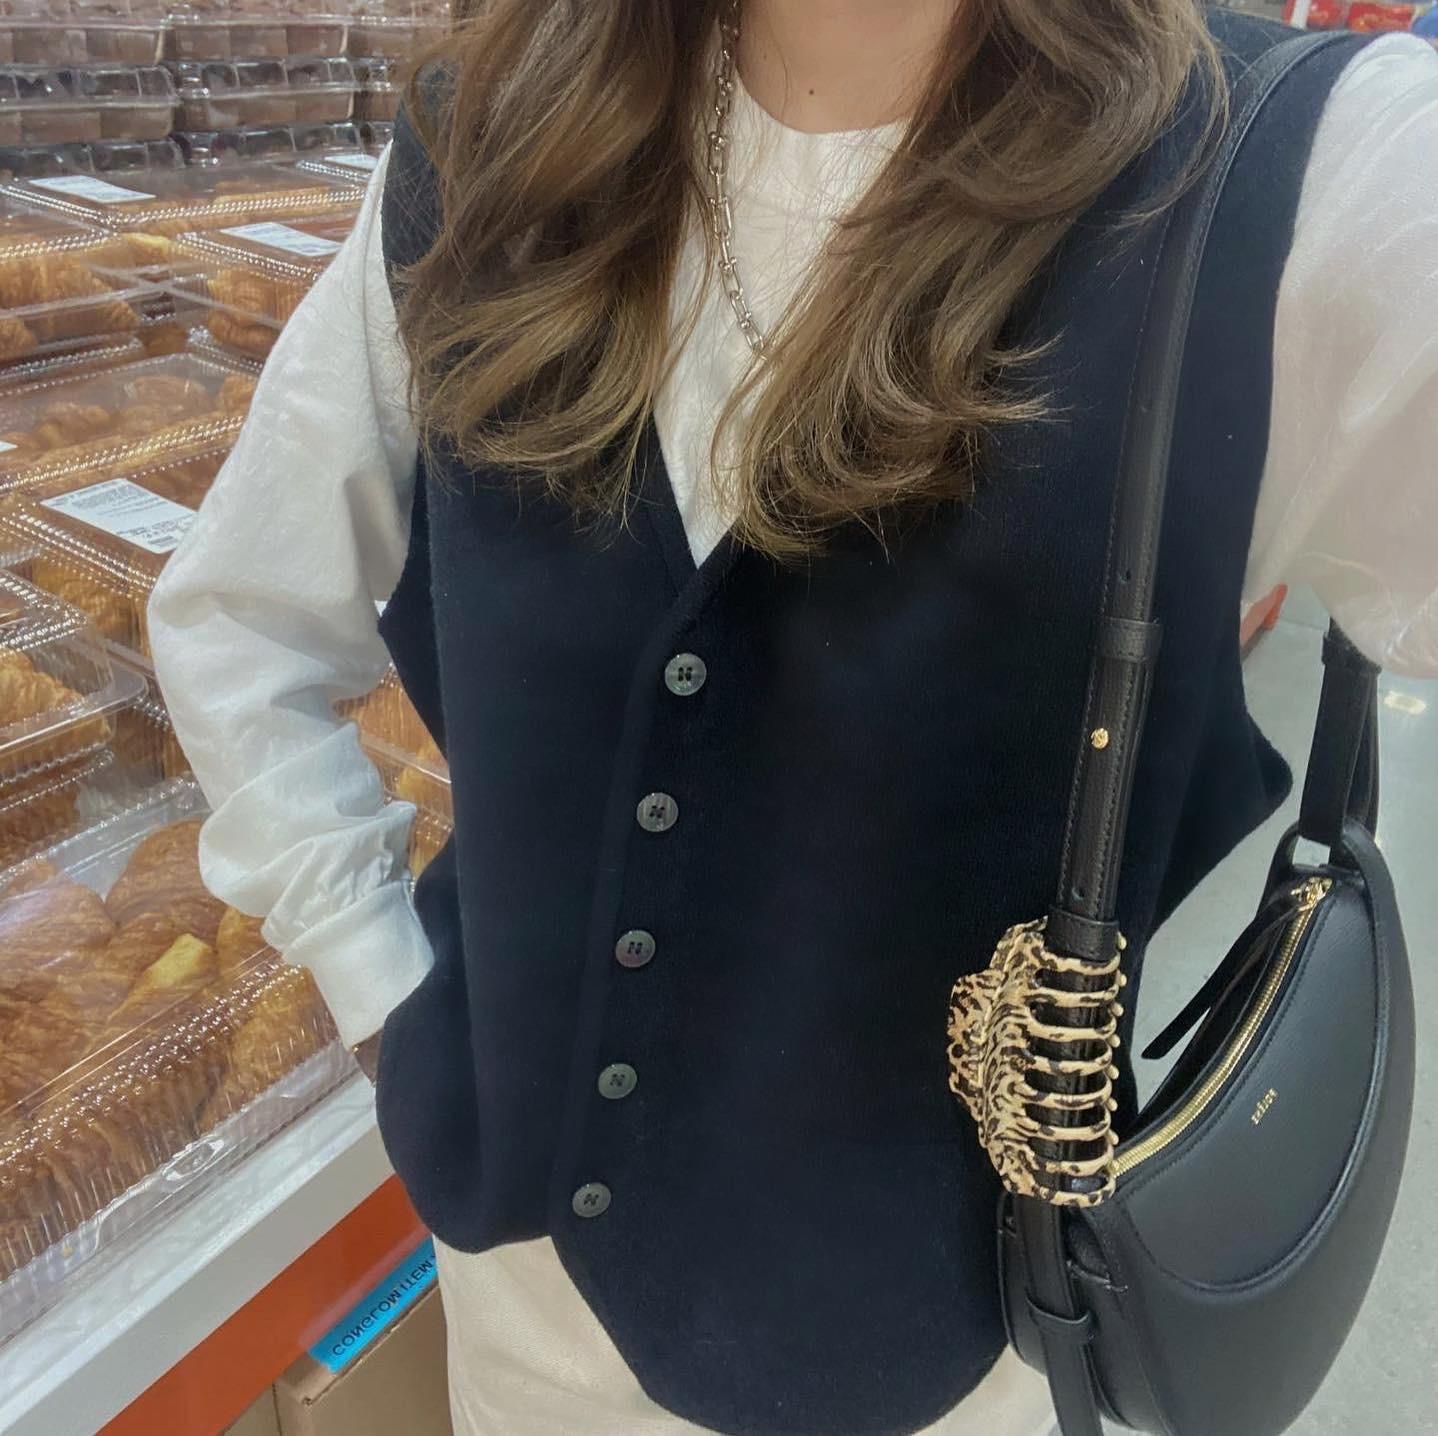 DAYNYC hershey vest